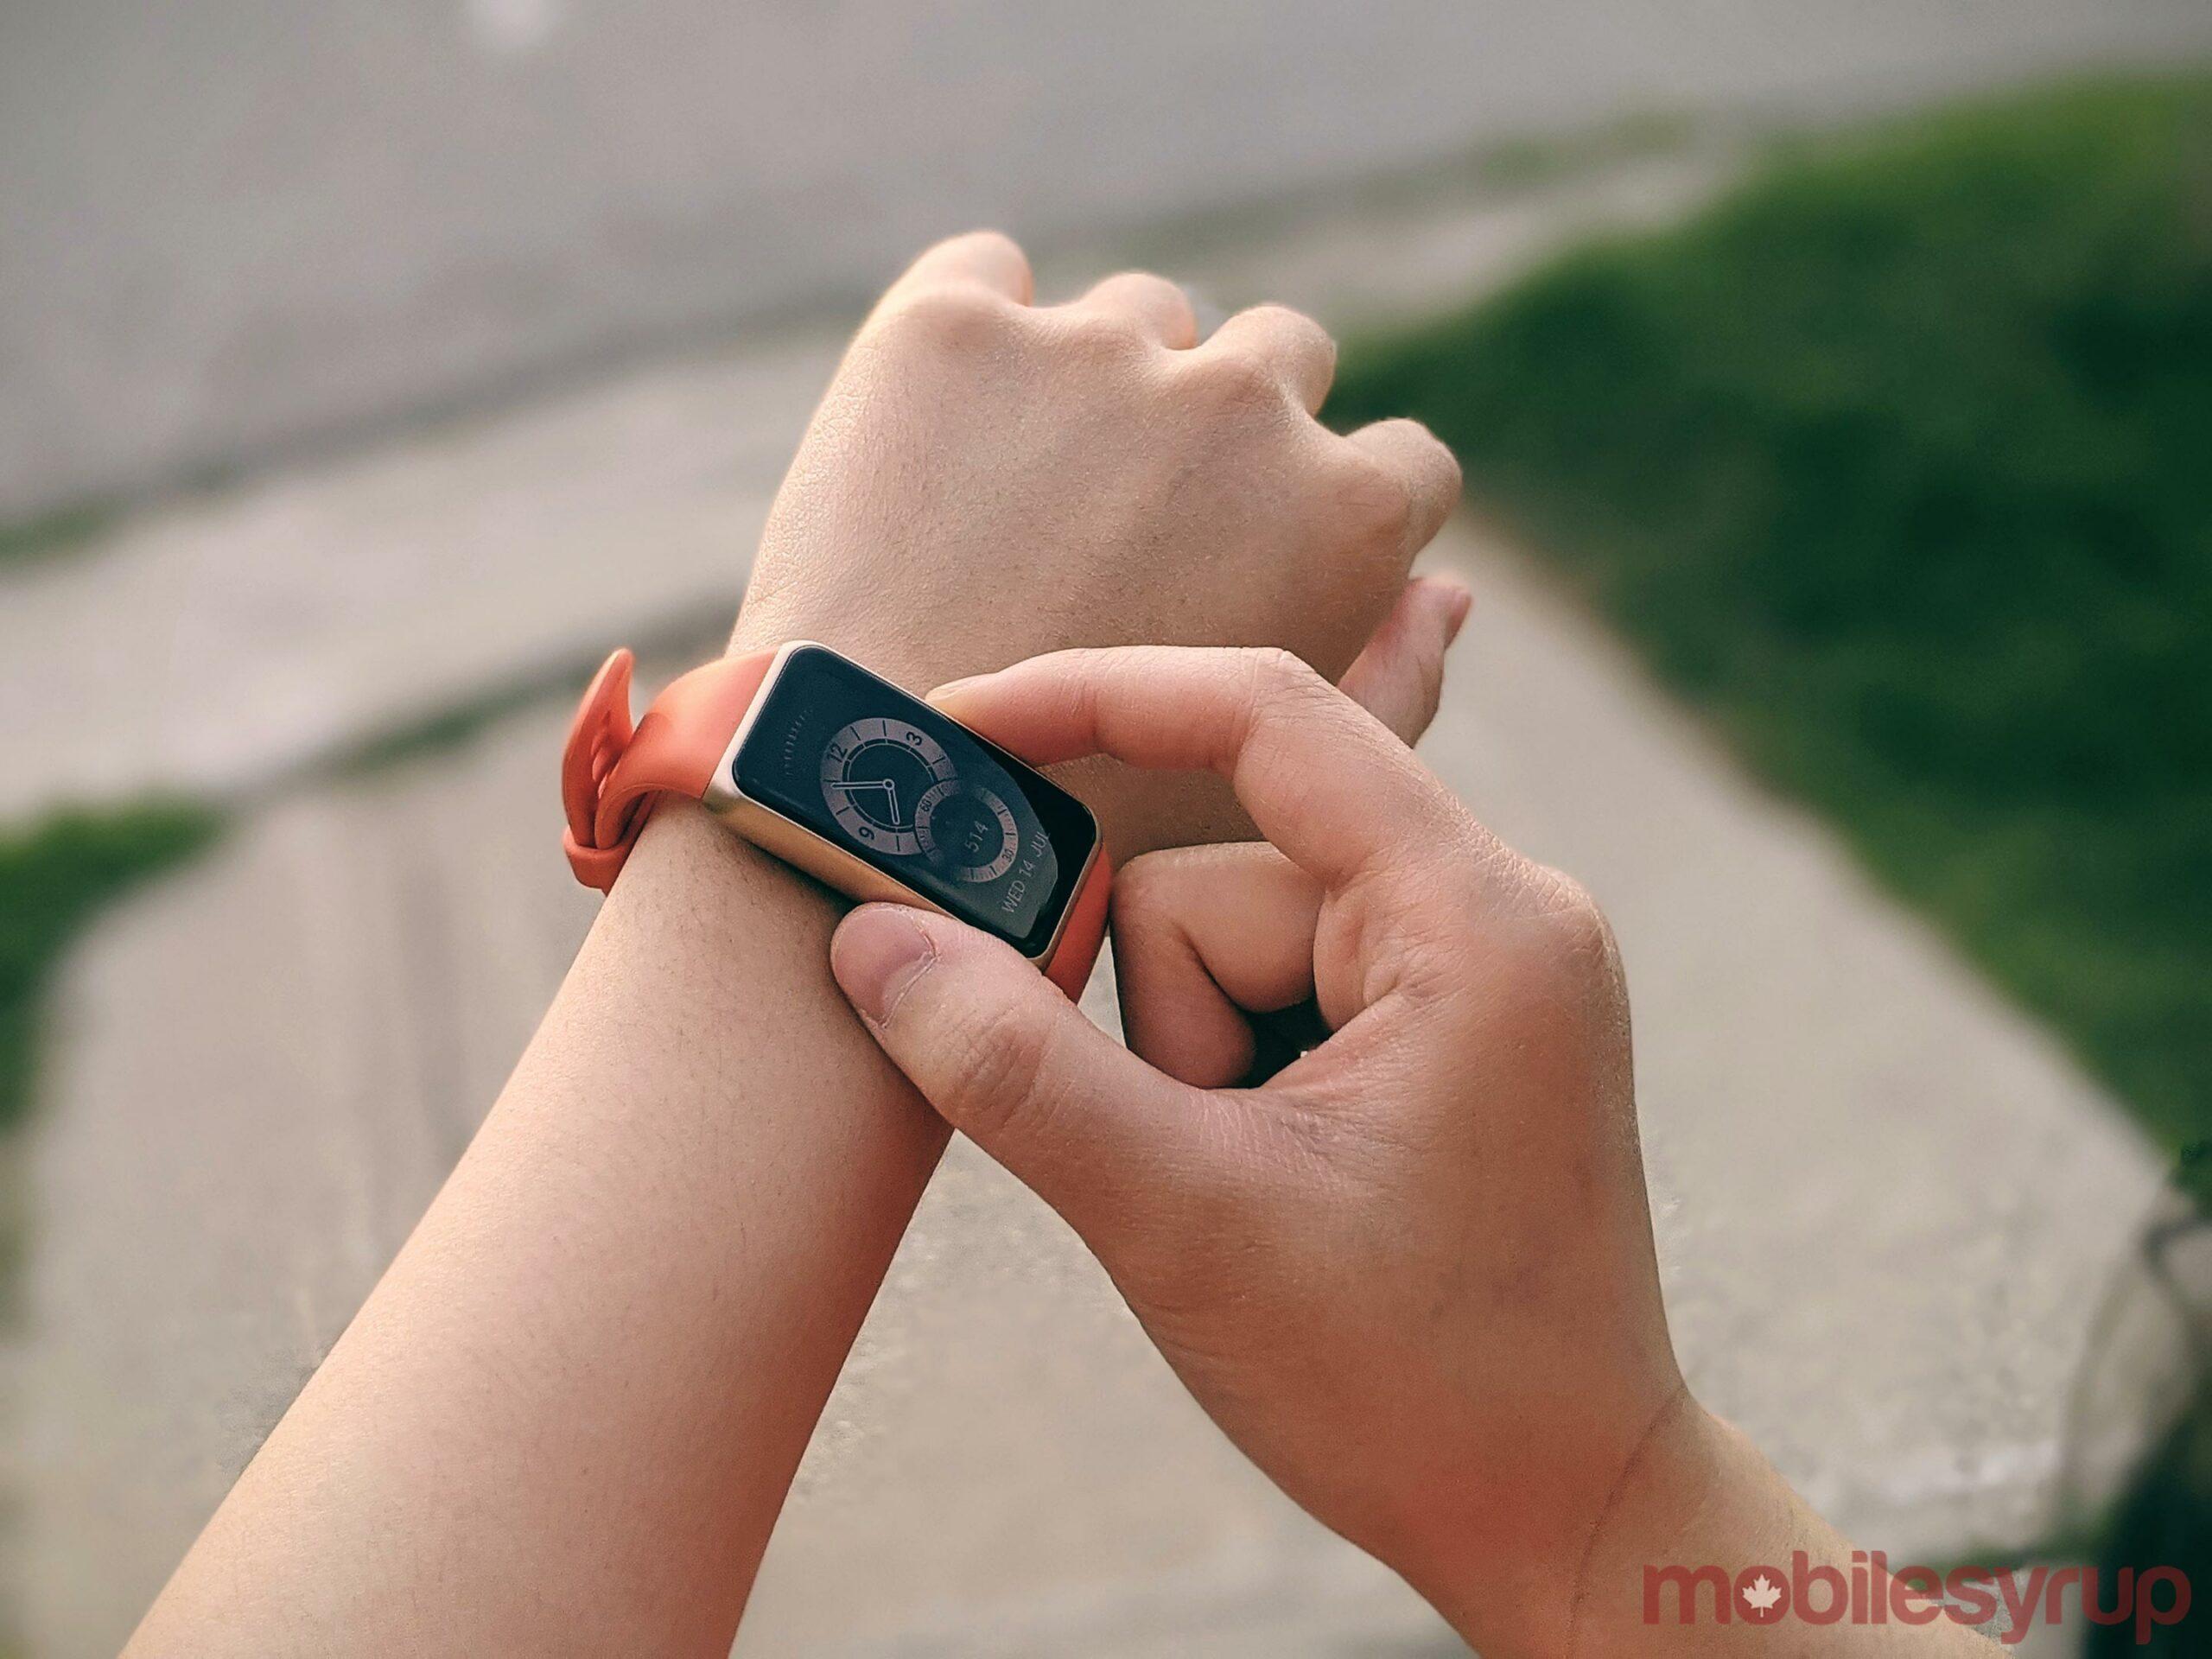 Huawei Band 6 on wrist outdoors